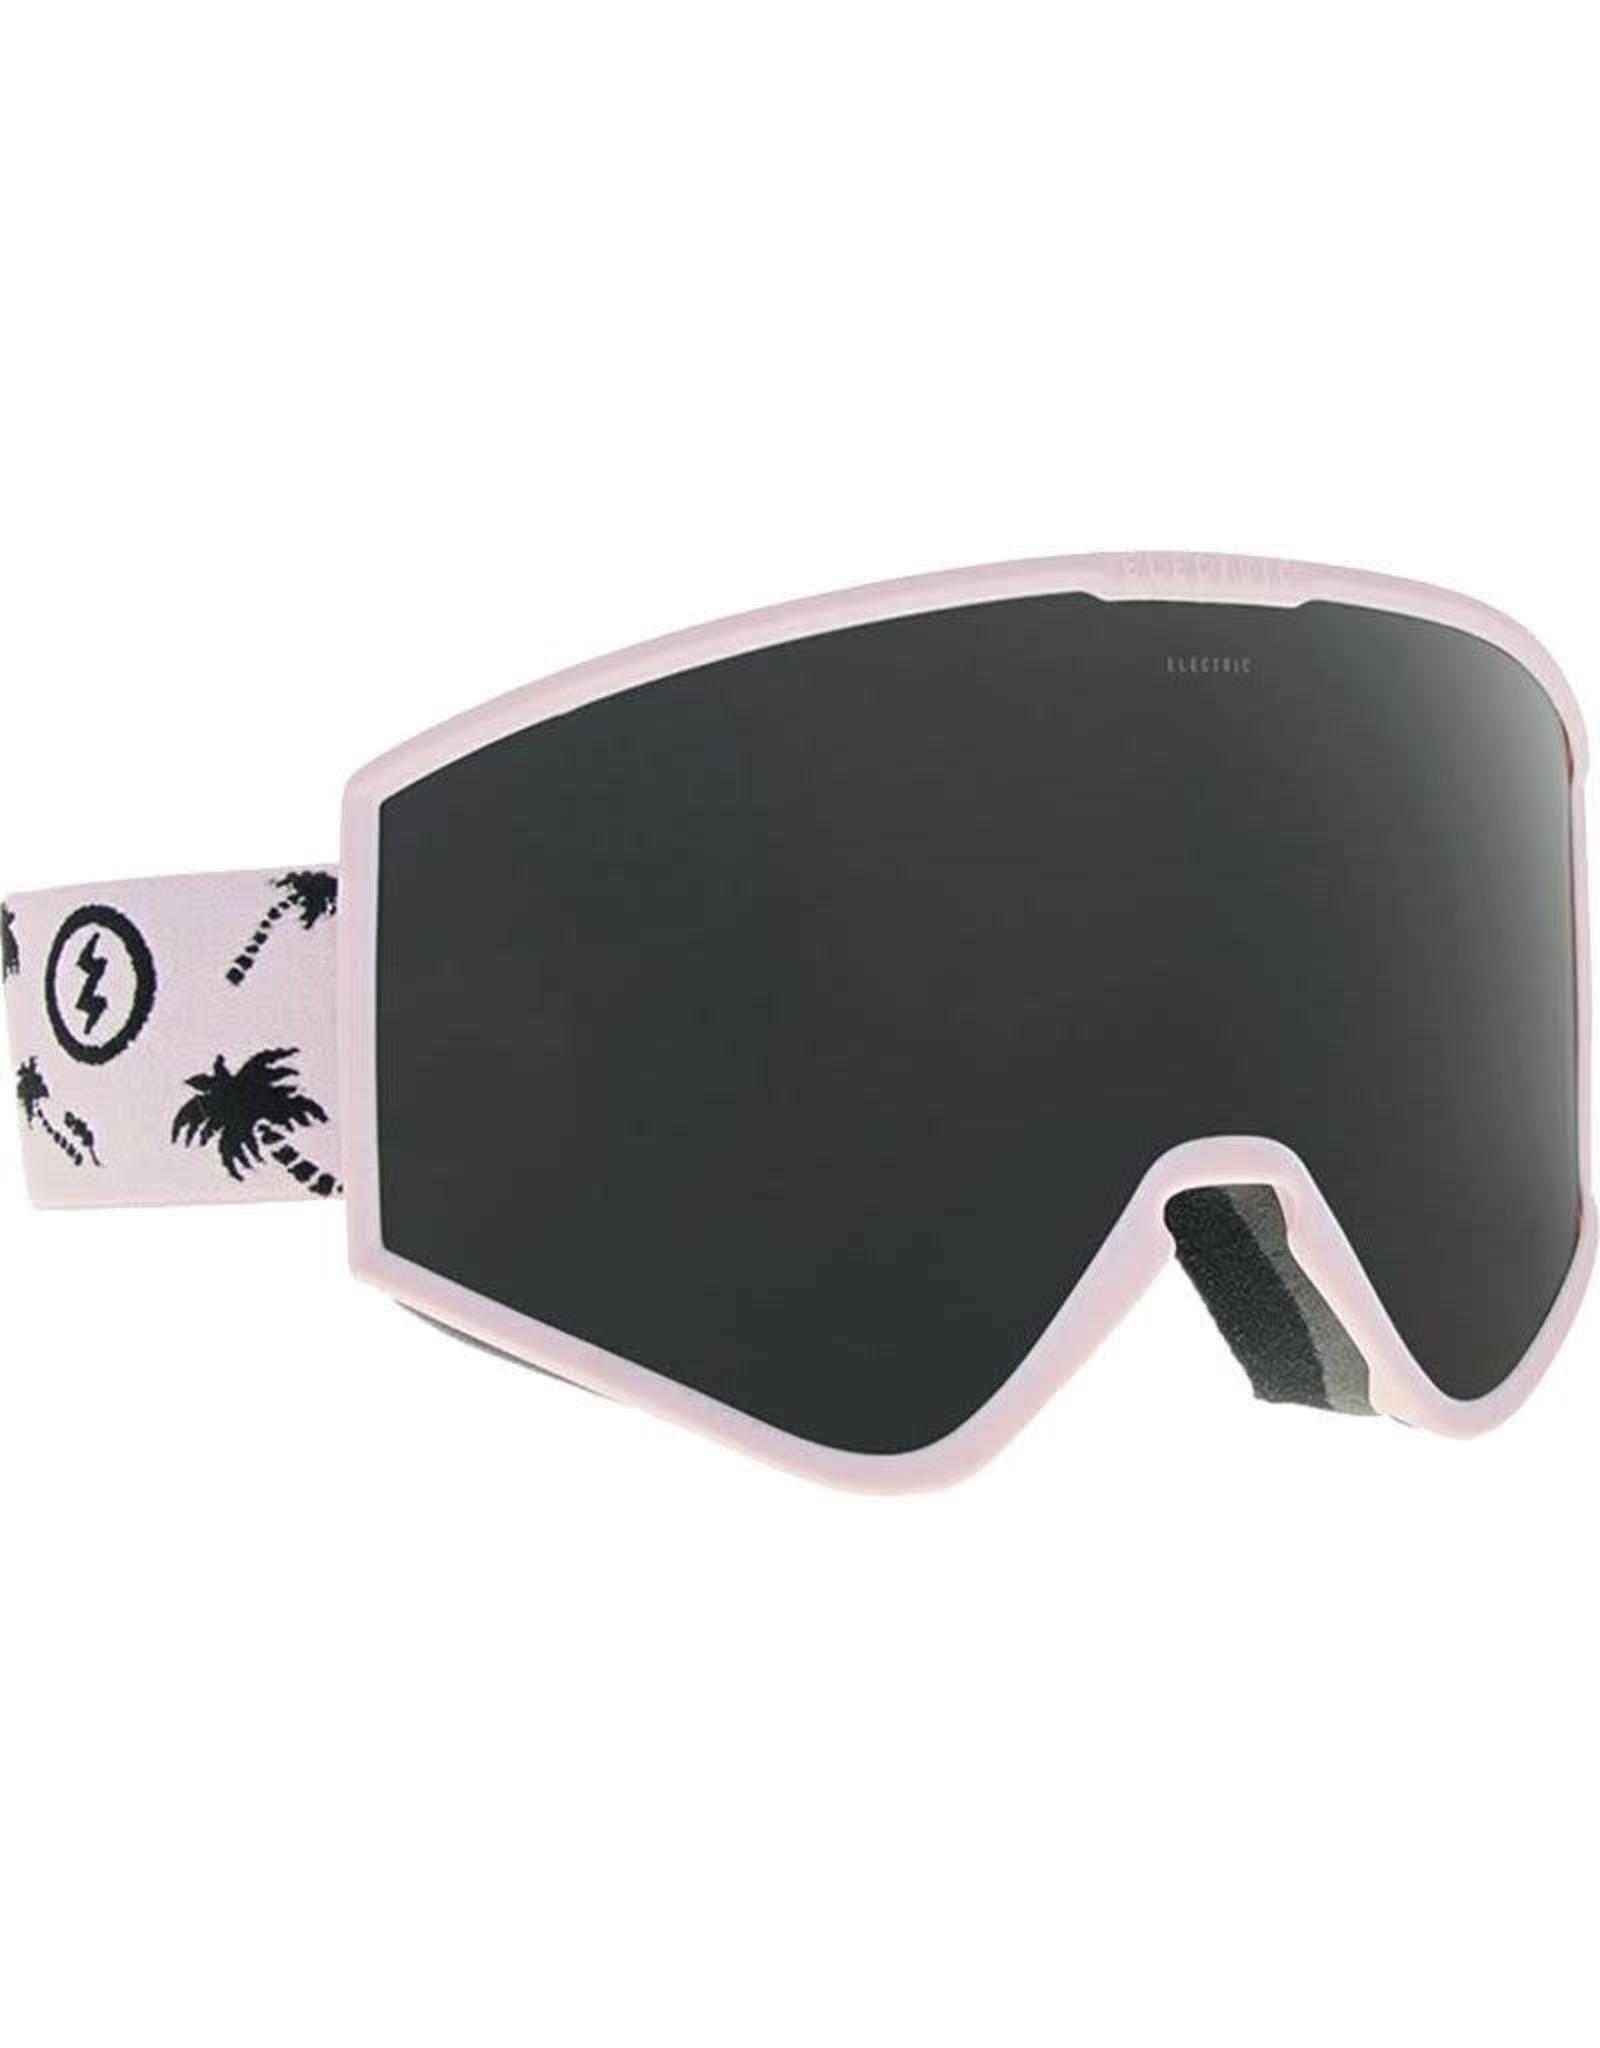 electric Electric - lunette snowboard kleveland possy pink/ jet black